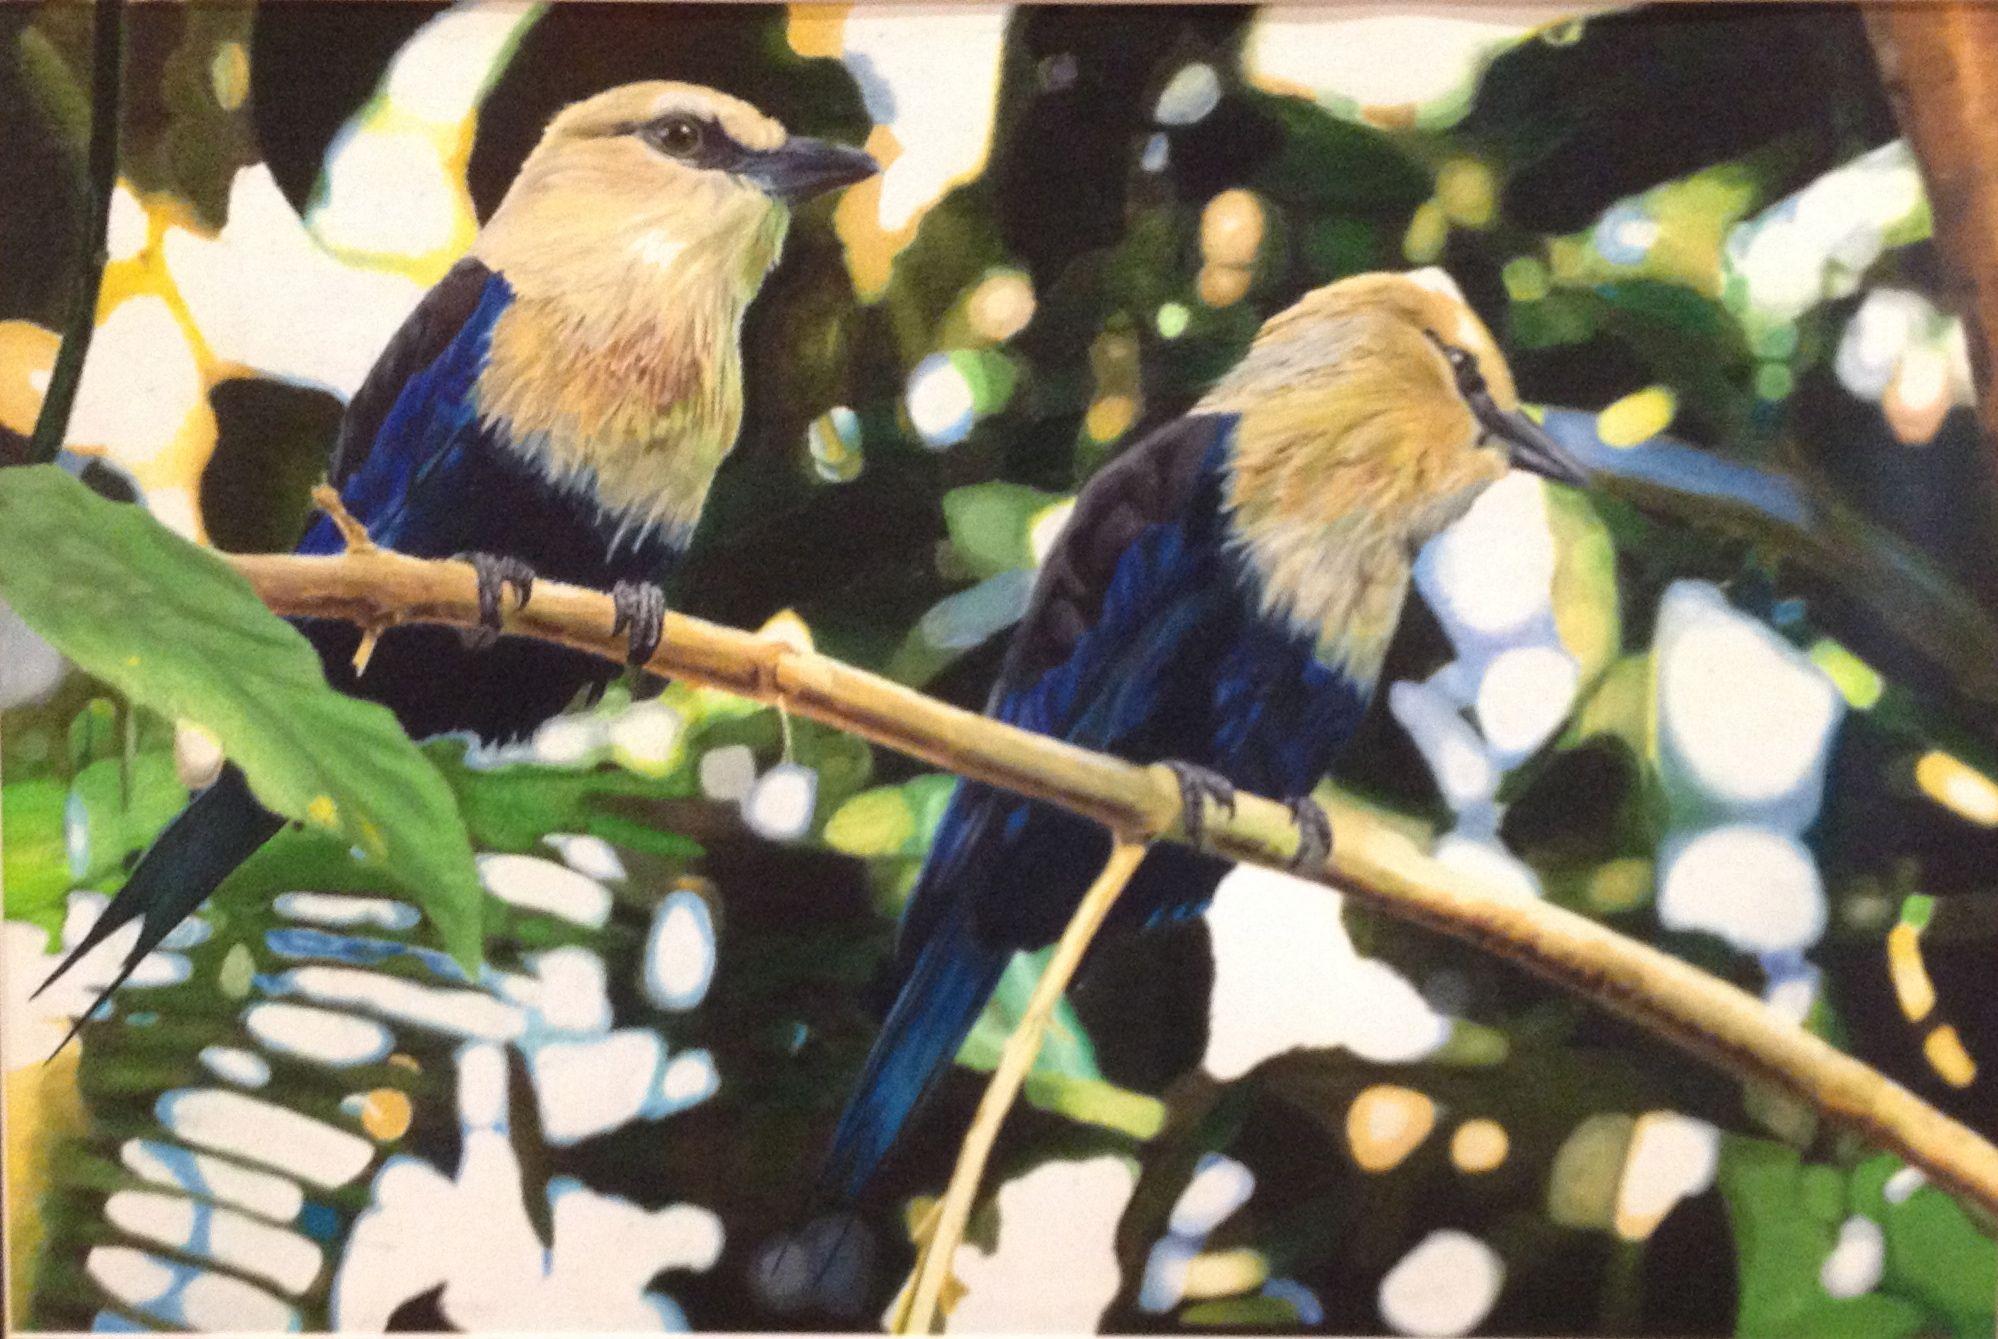 """Brother Birds"" by Israel Jimenzez from the Southmore Intermediate School art program. #ArtColony #HouArtFest"